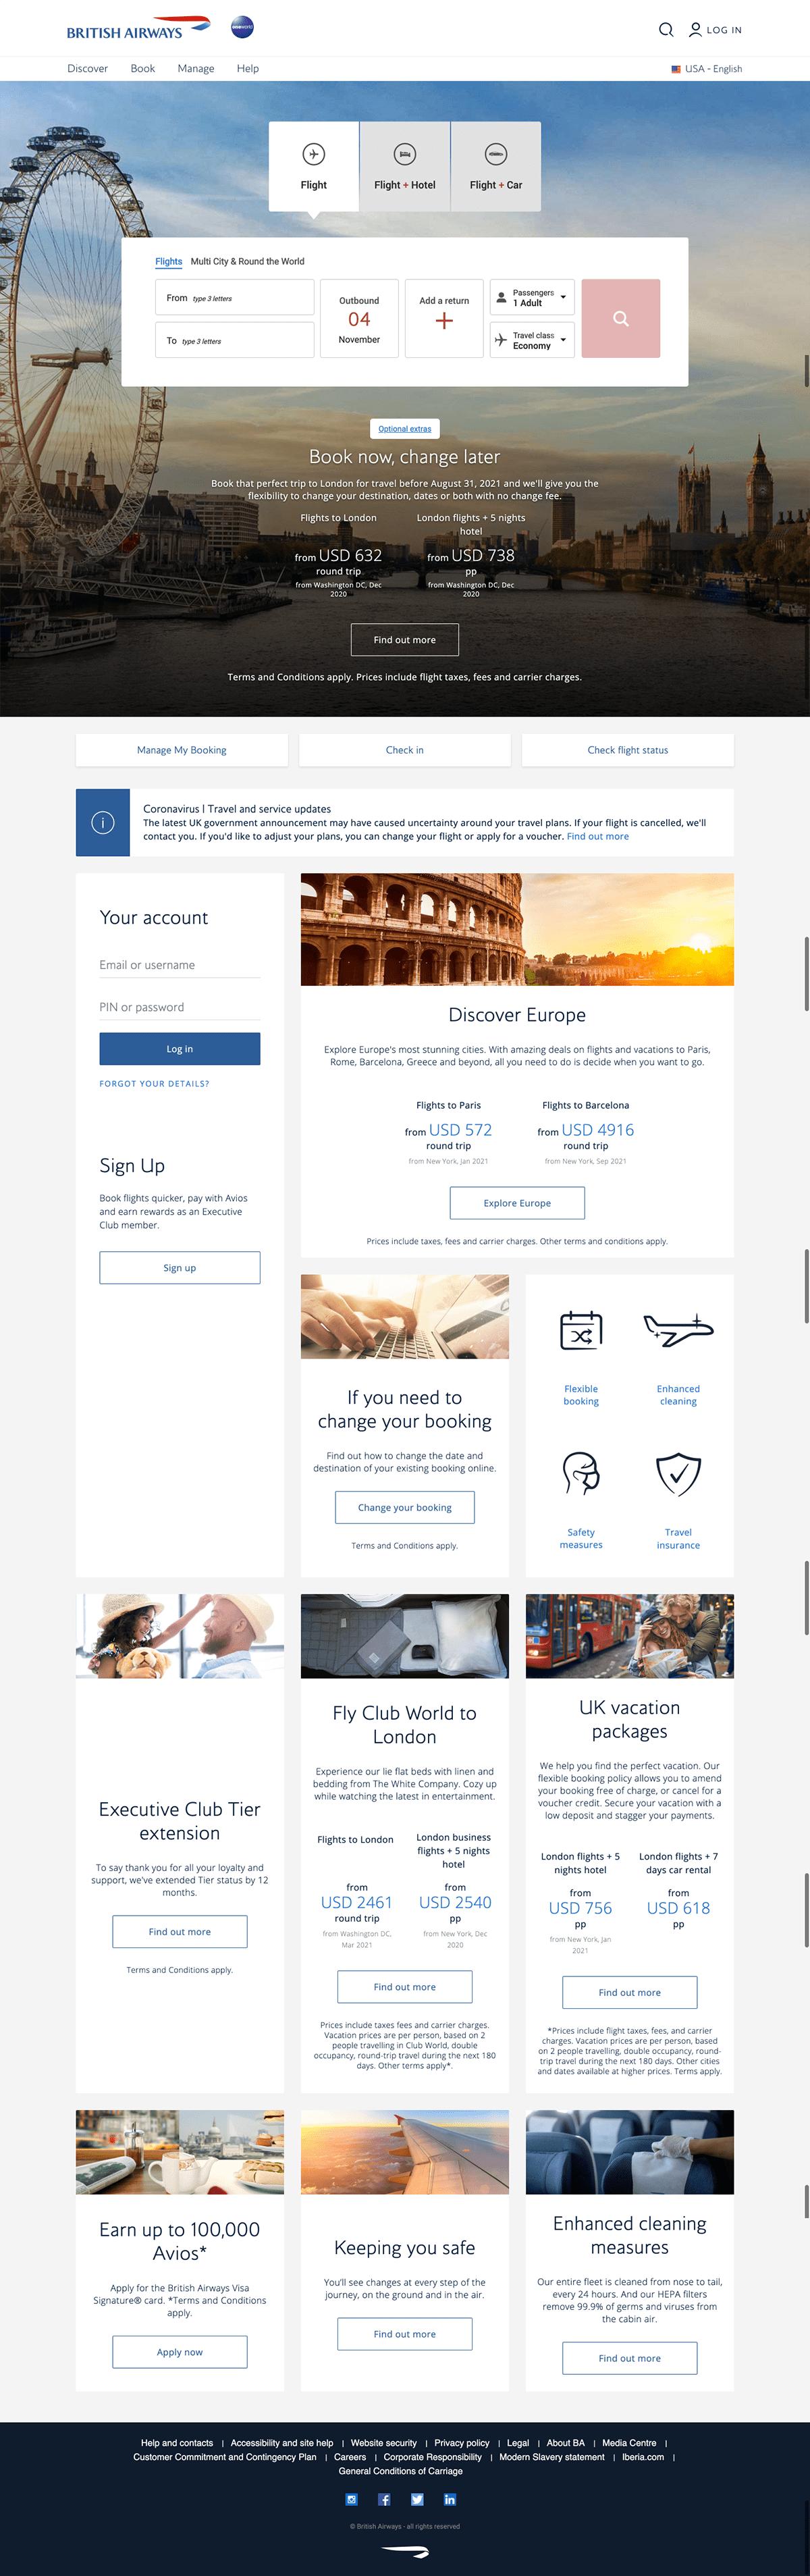 British Airways Travel Landing Page